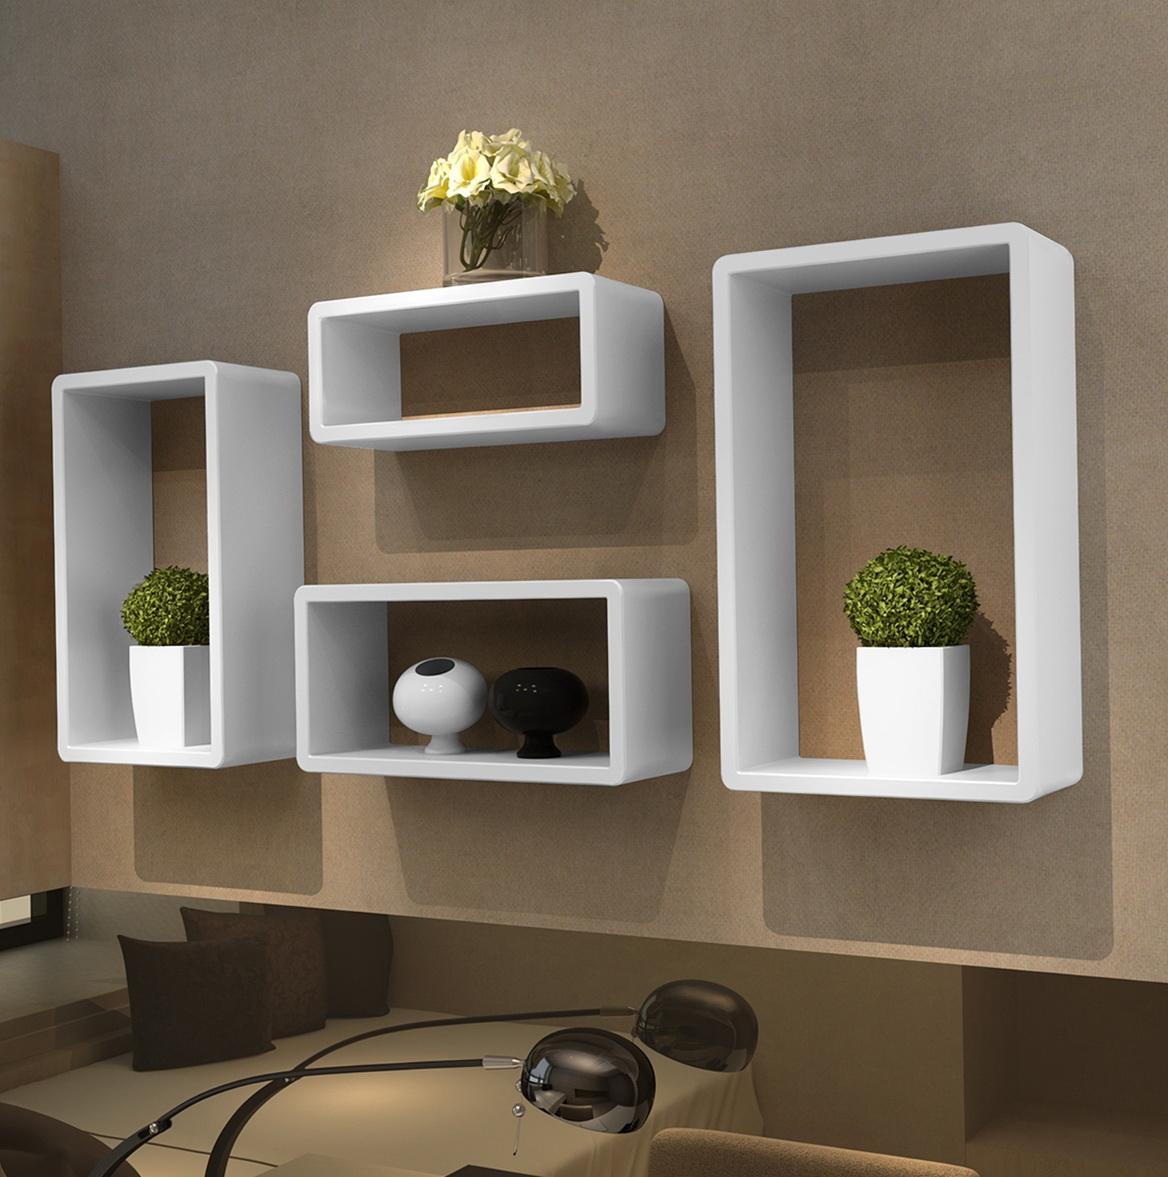 Ikea Wall Shelf Box